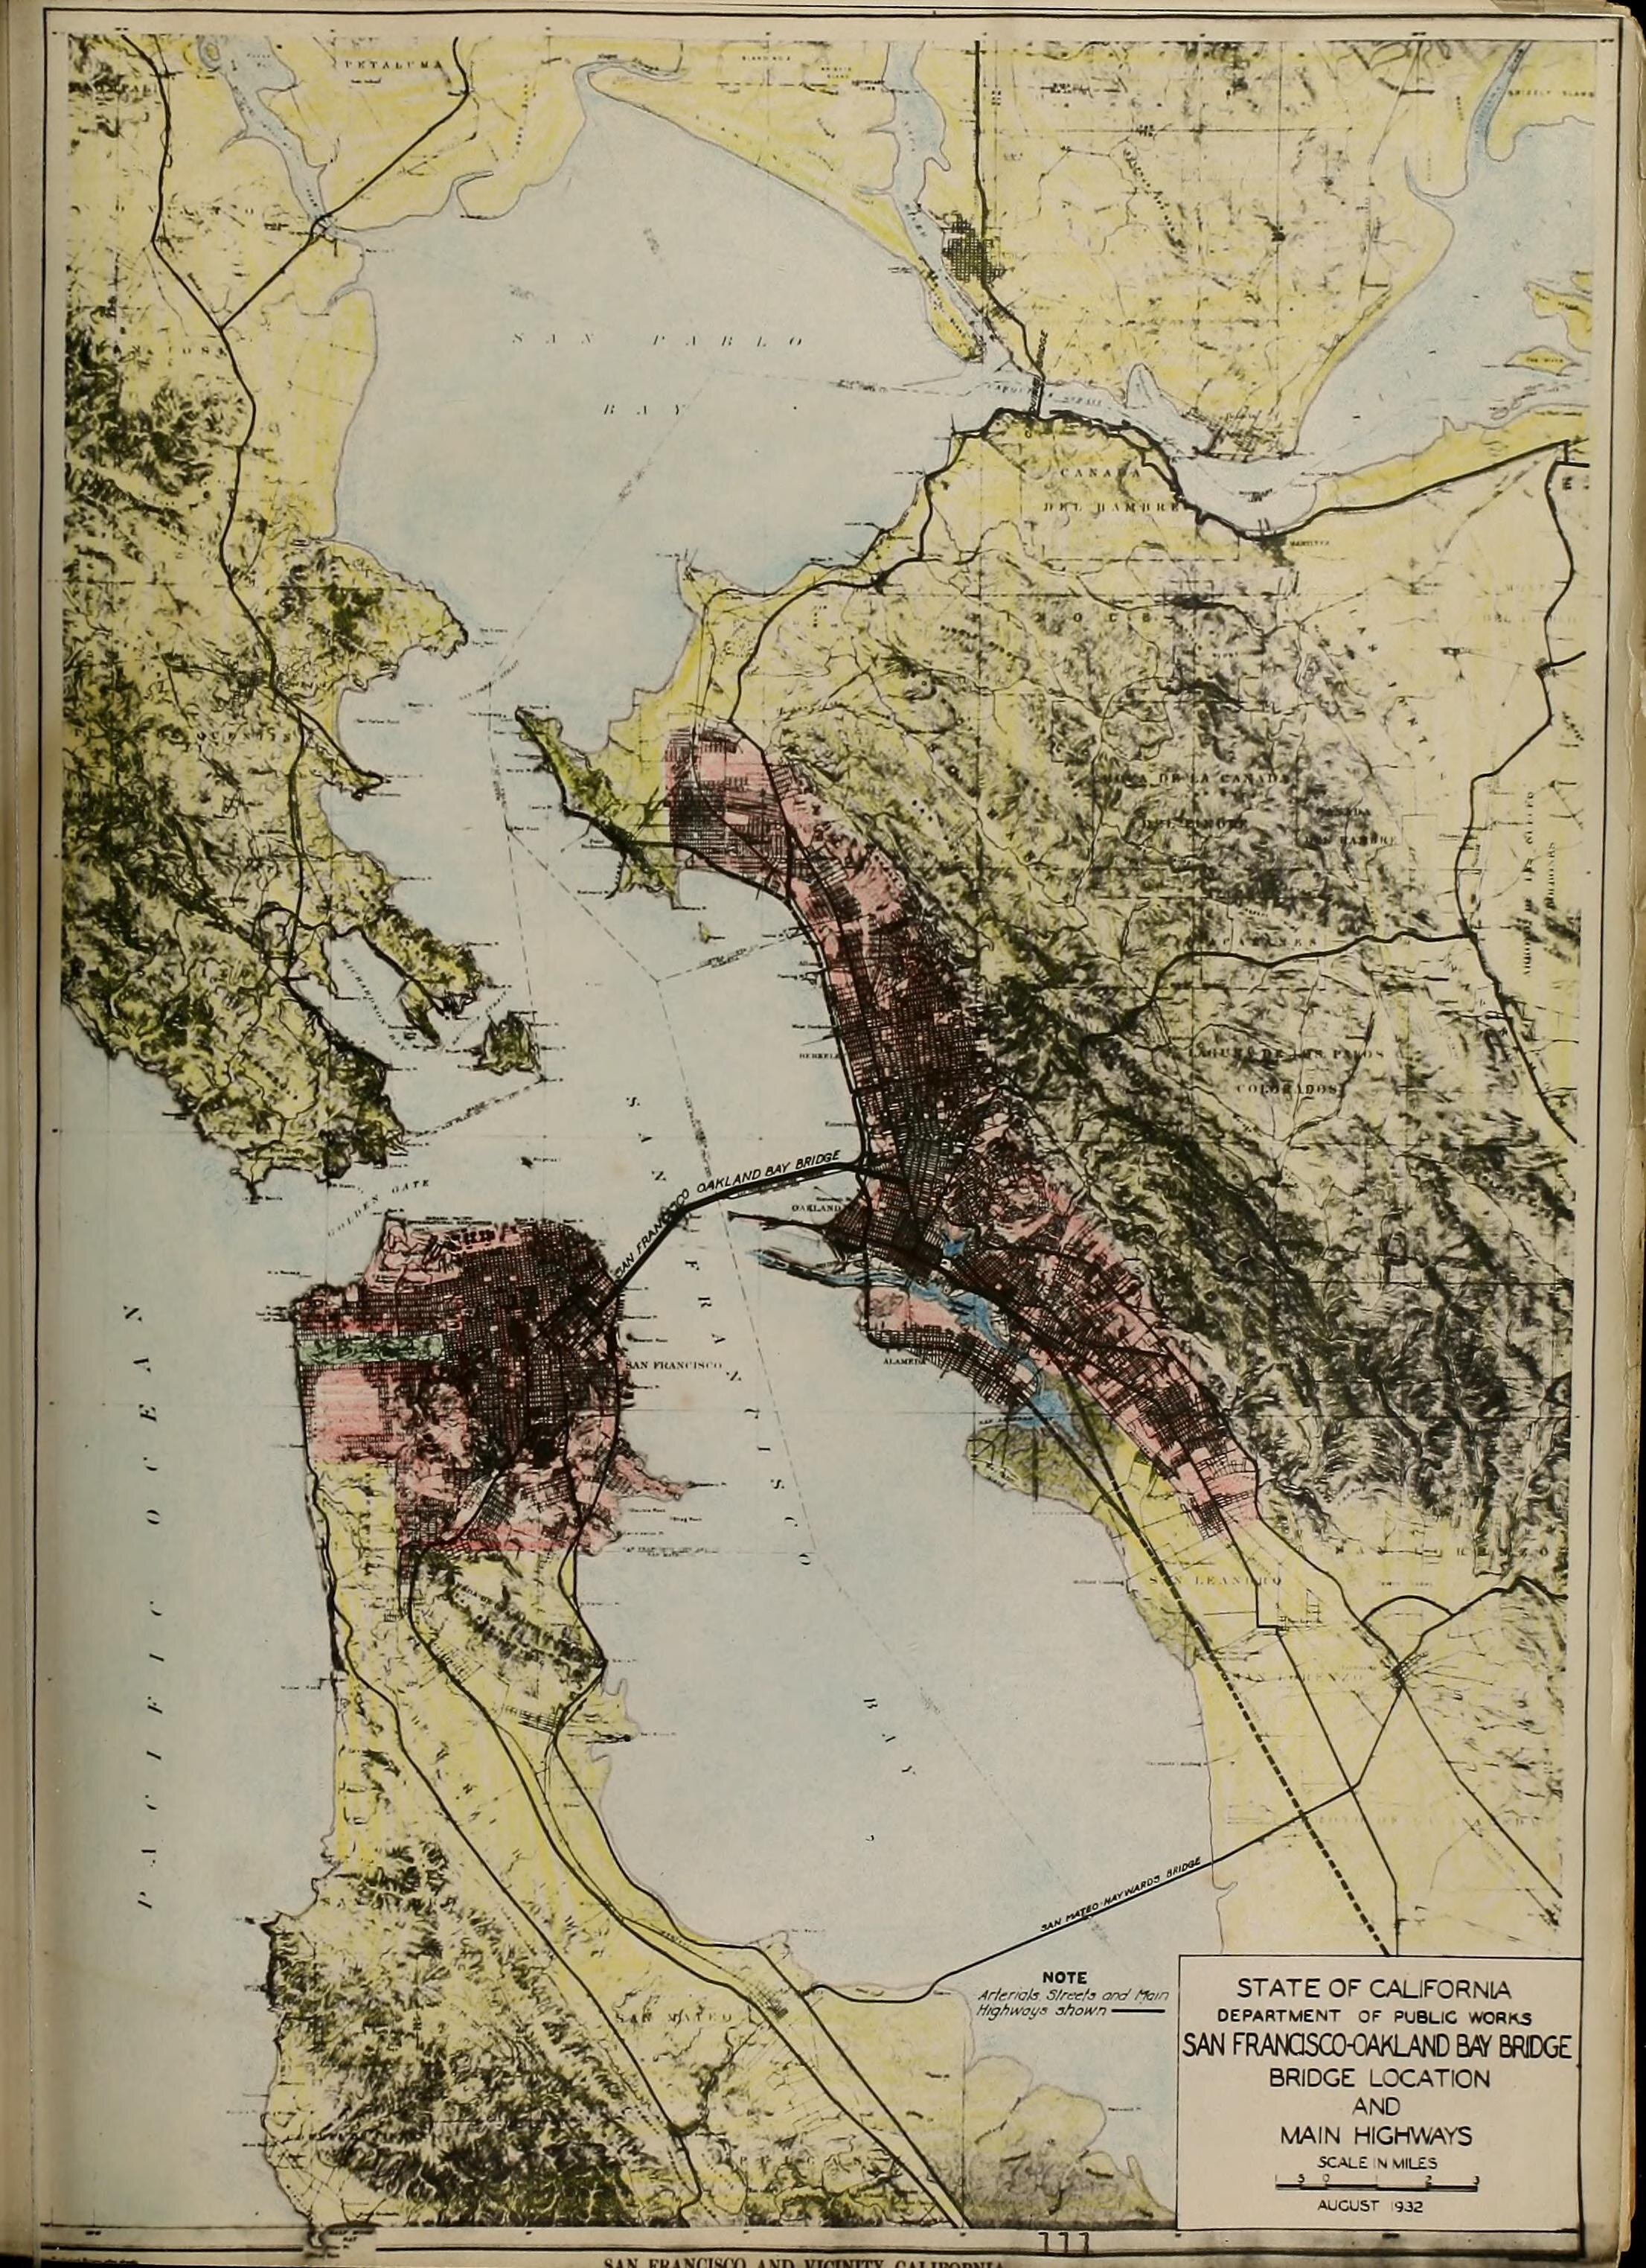 San Francisco-Oakland Bay Bridge, Bridge Location (map).   San Francisco-Oakland Bay Bridge: Report to the California Toll Bridge Authority , State of California Department of Public Works, August 1932, p. 111. Source:  Internet Archive .